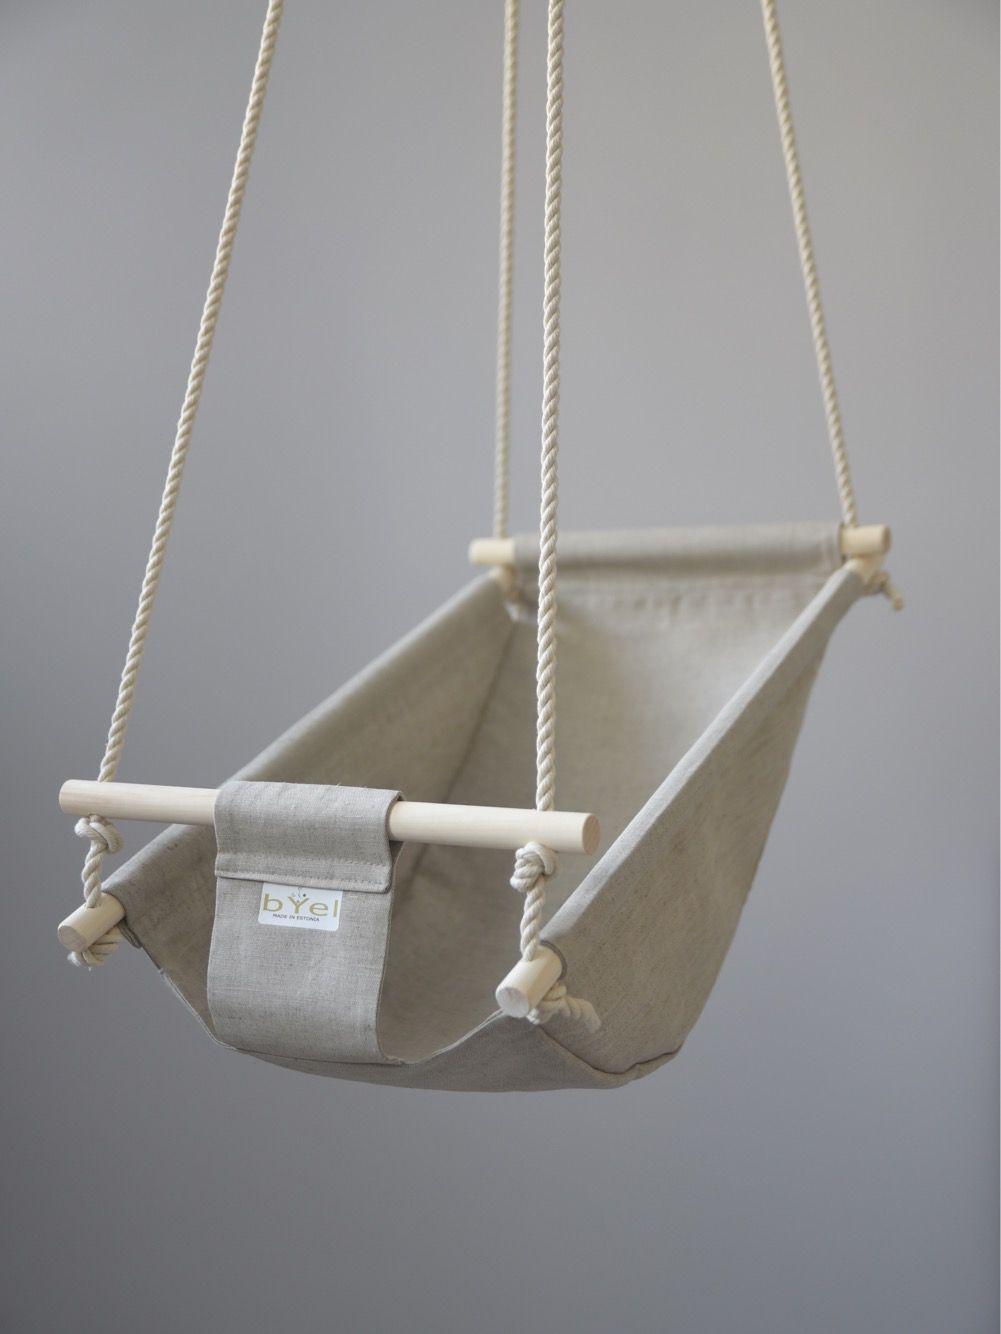 birthday baby decor gift hammock present calming swing indoor nursery first shower chair